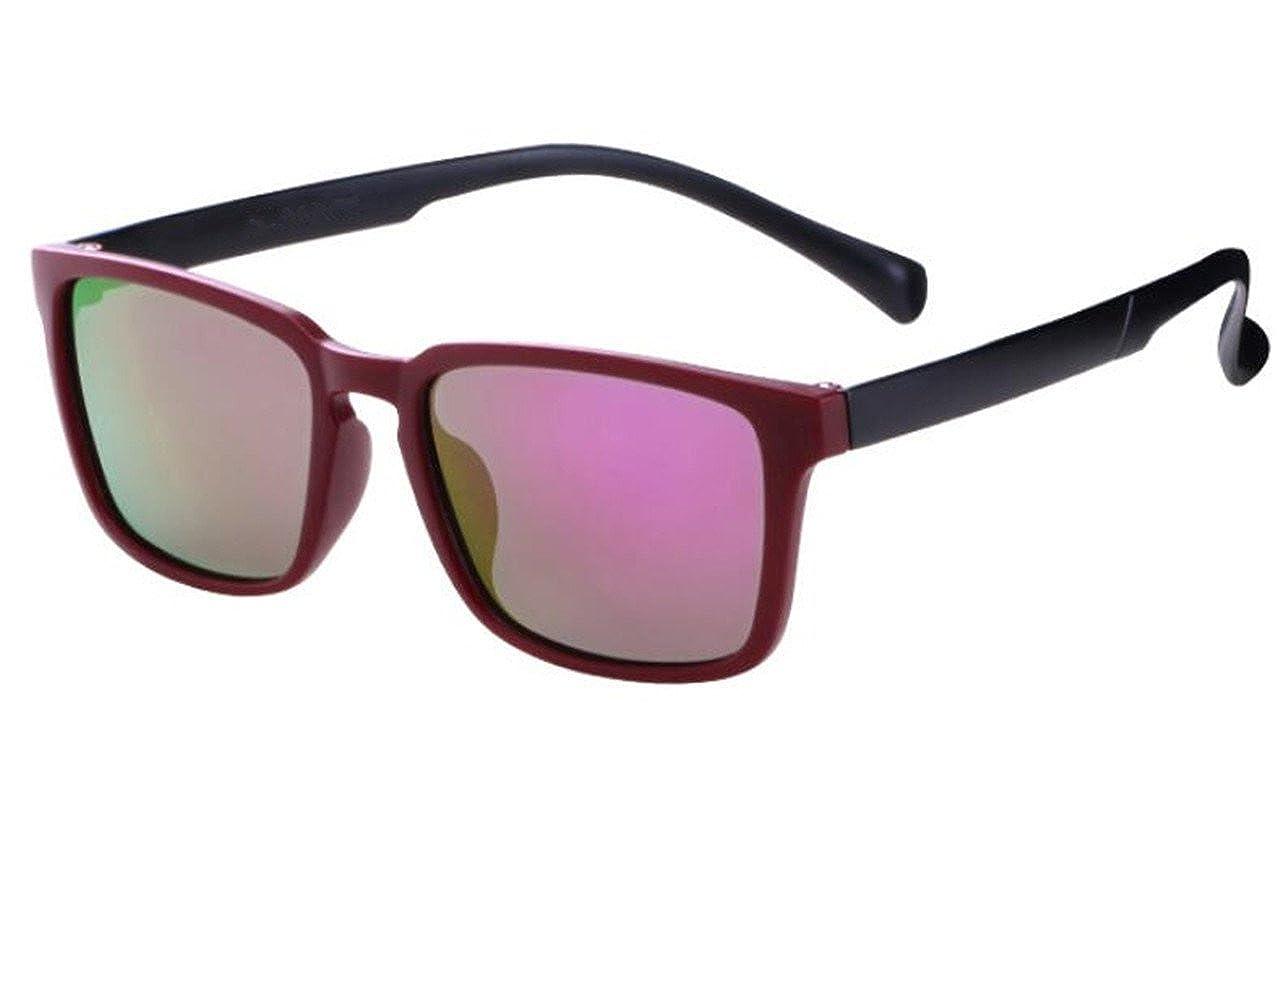 Red black box purple Film SUNGLASSES New Polarized Sunglasses Ladies Fashion Sunglasses Retrocolord Glasses